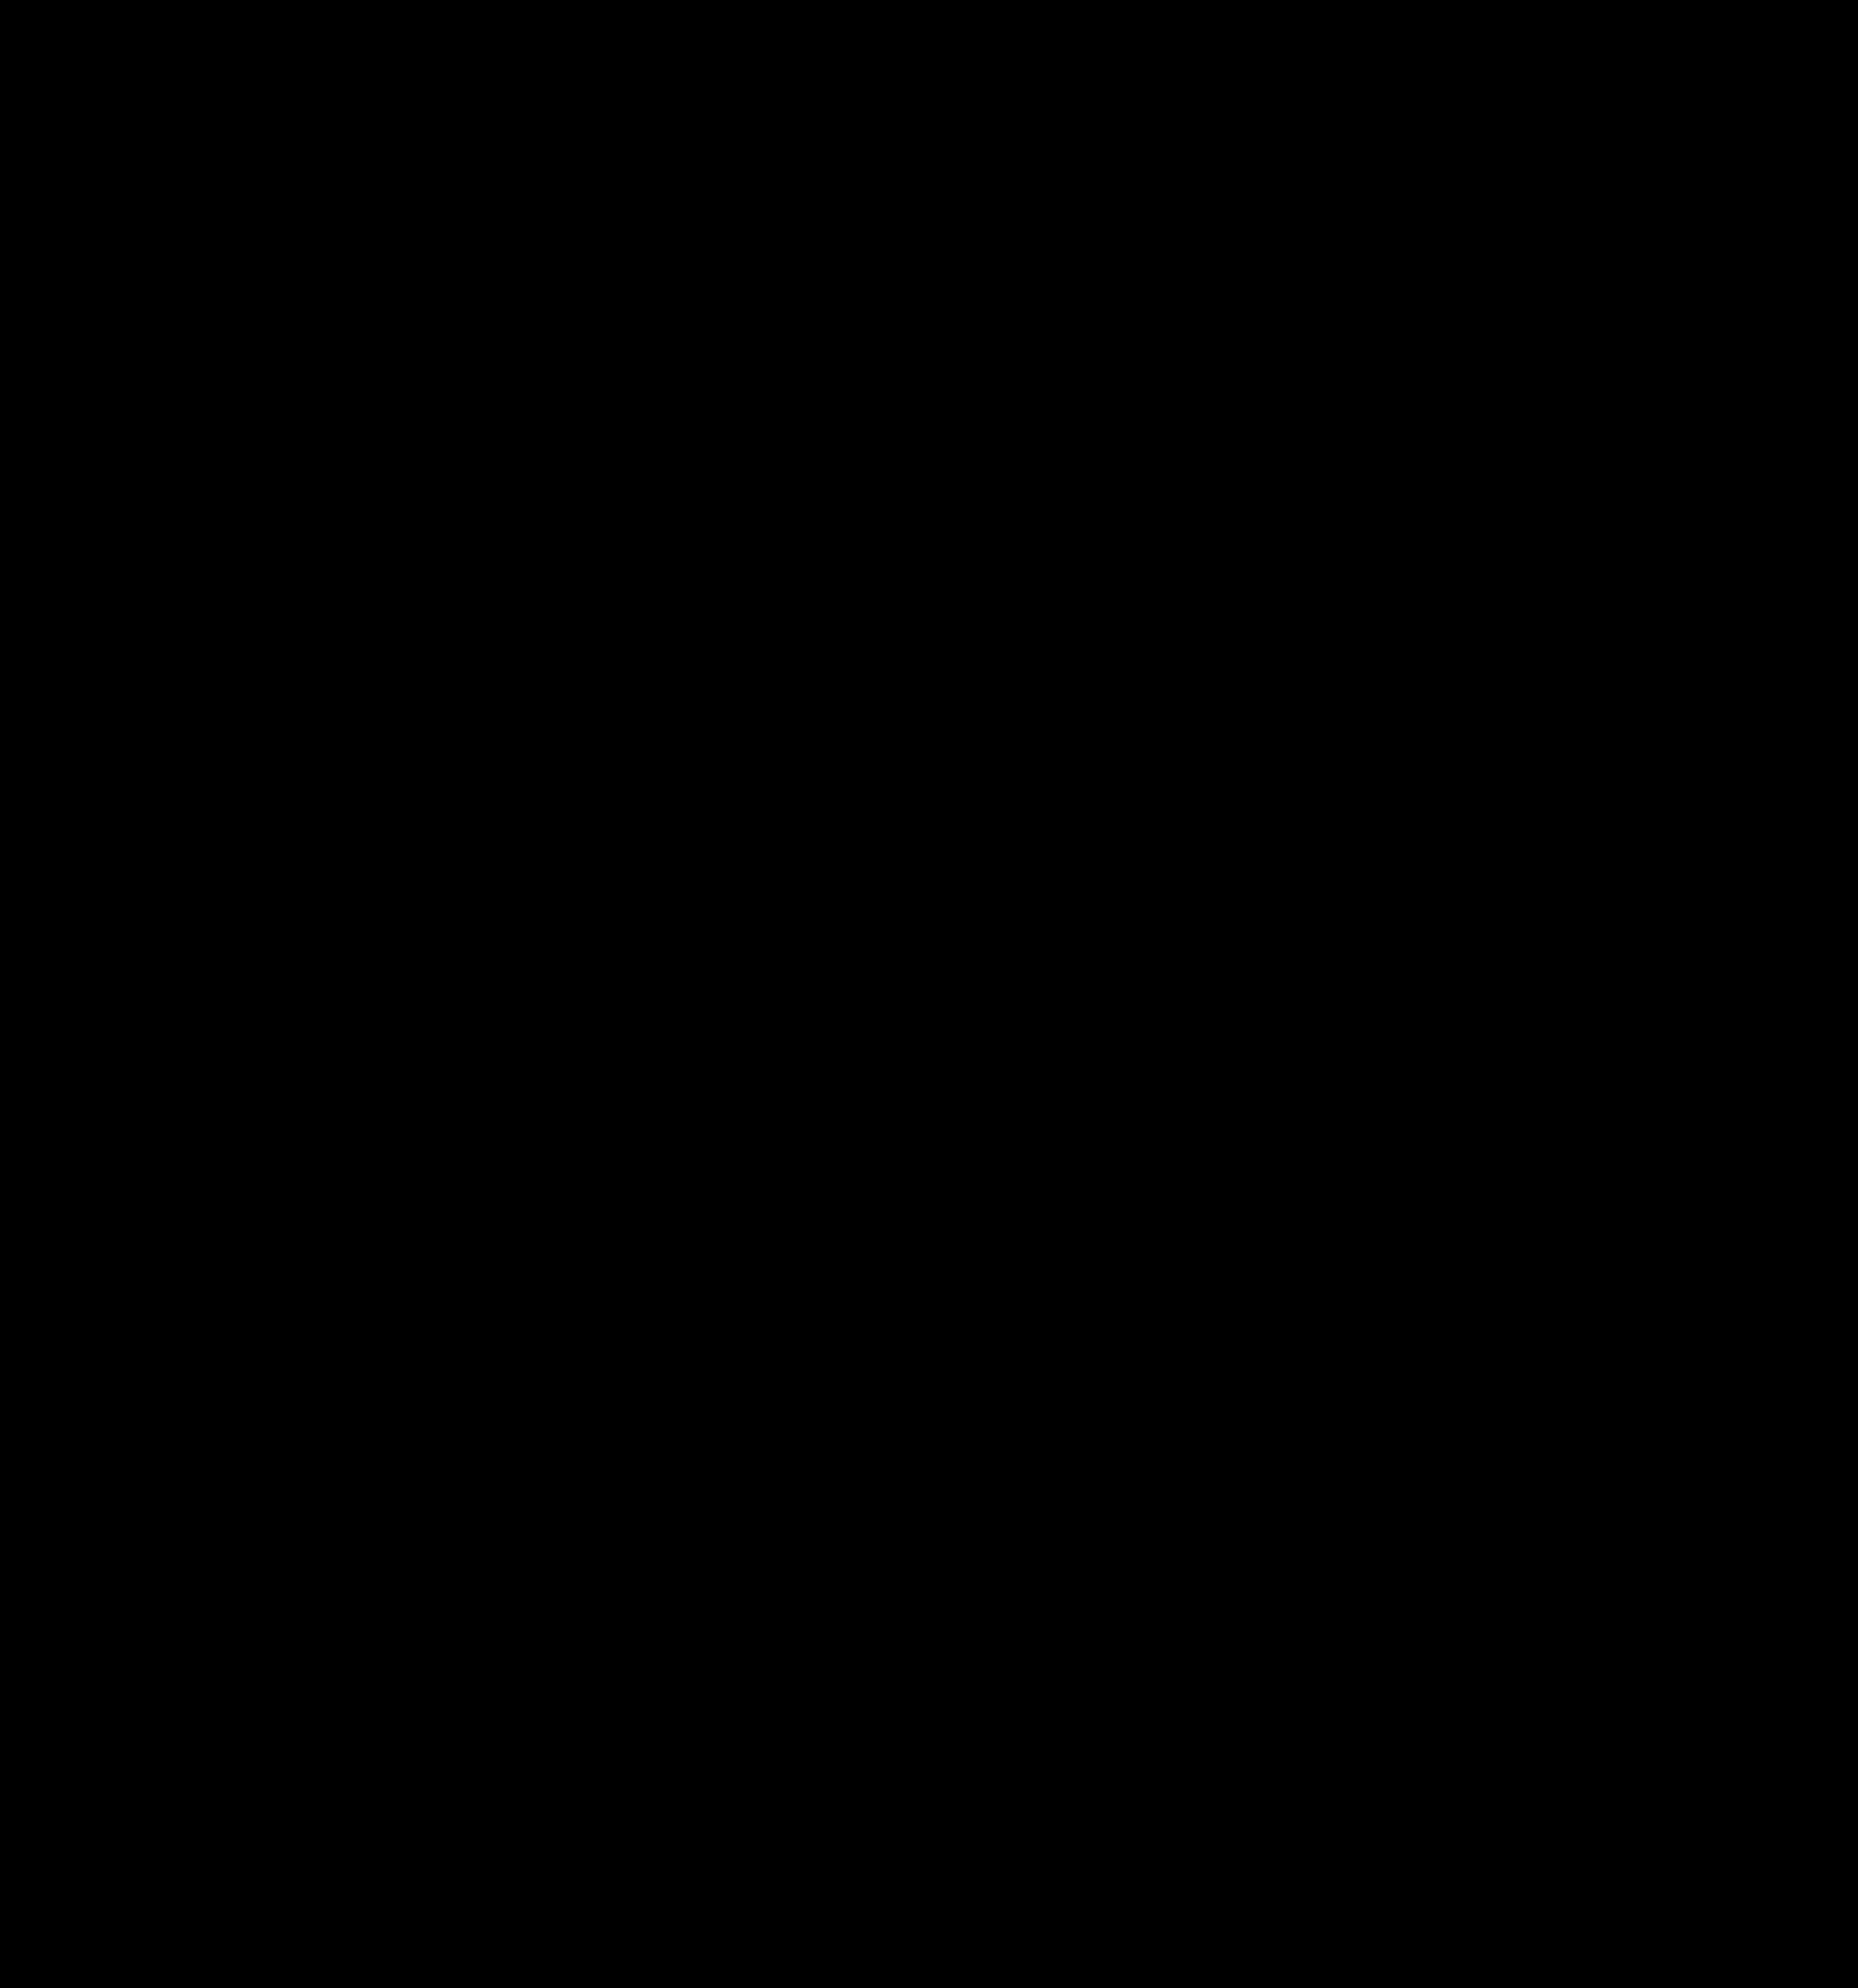 2178x2330 Clipart